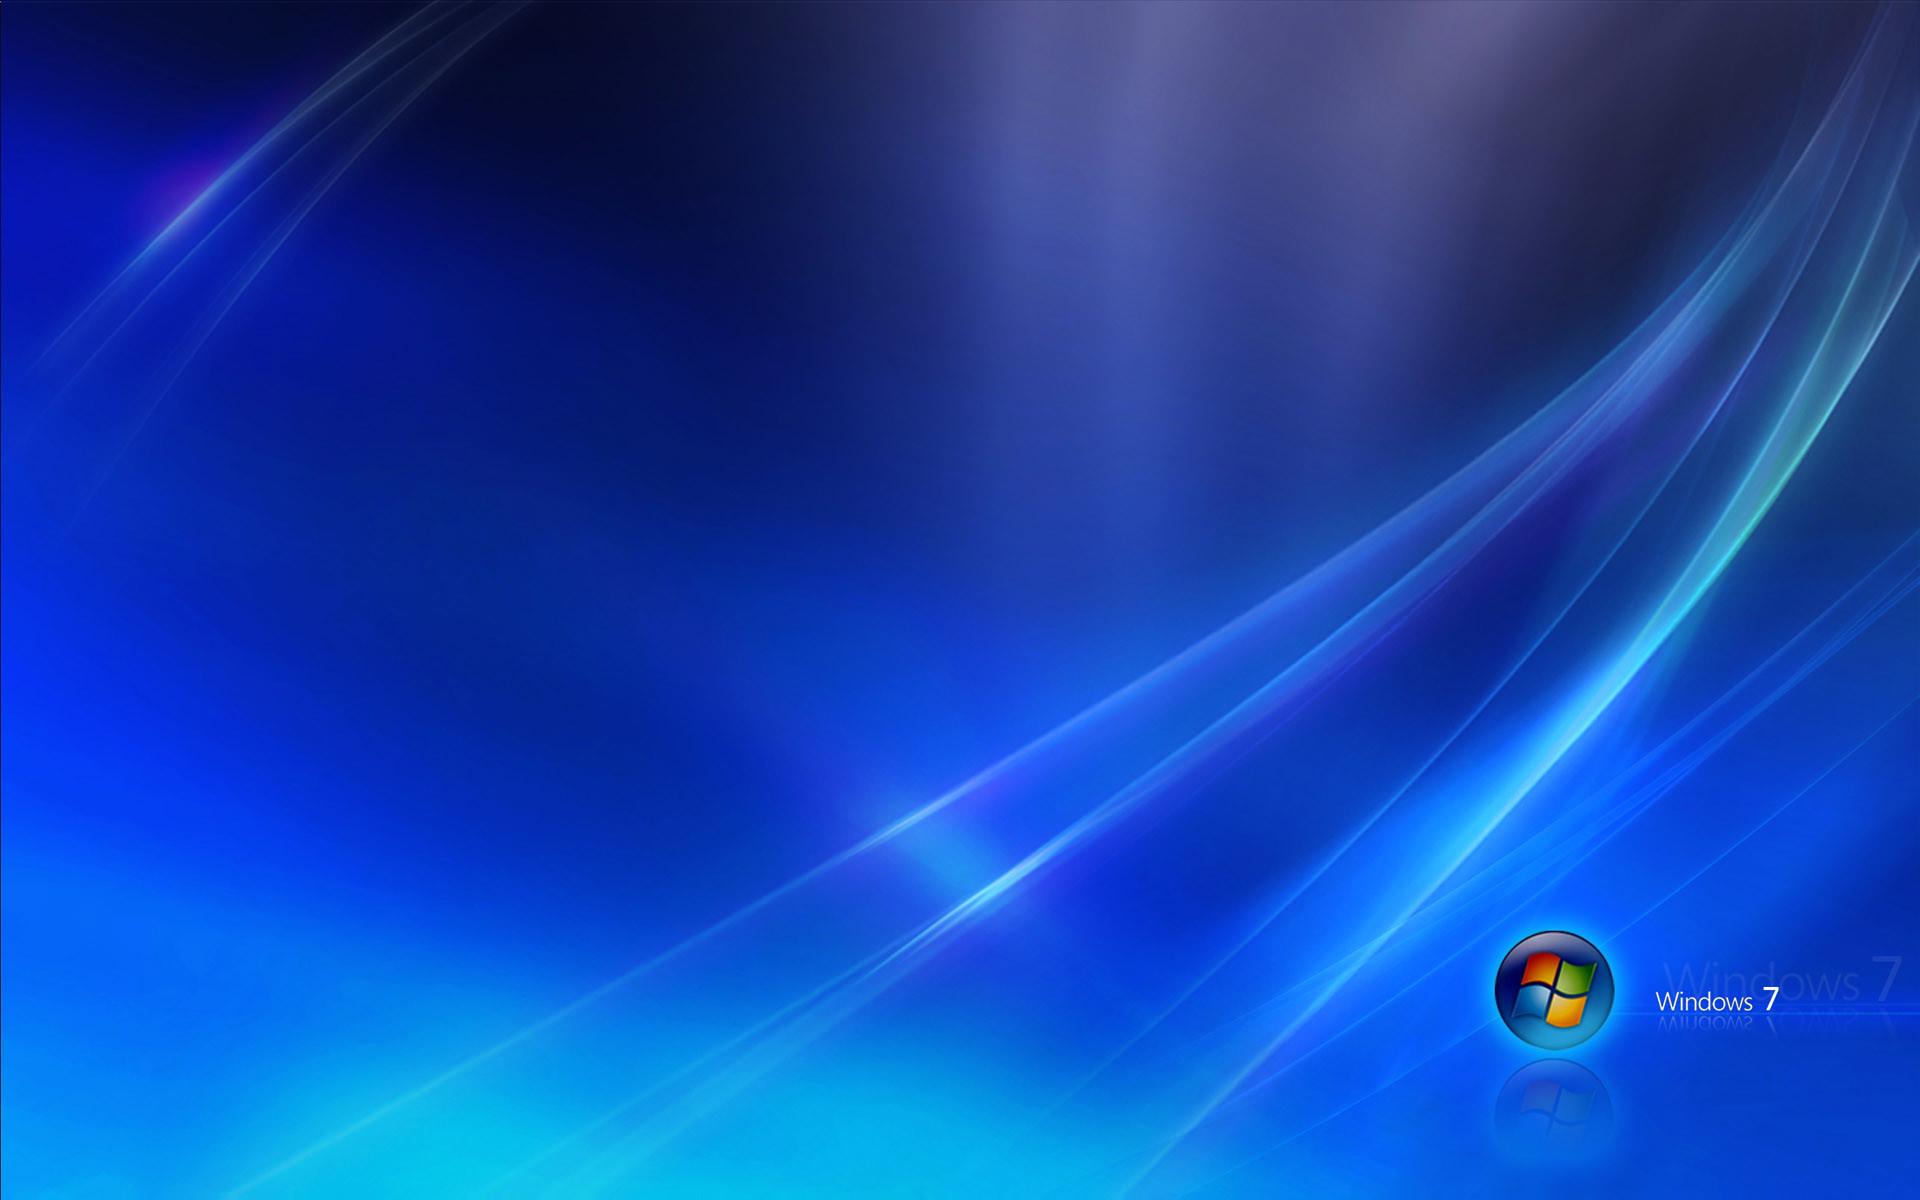 microsoft desktop backgrounds windows 7